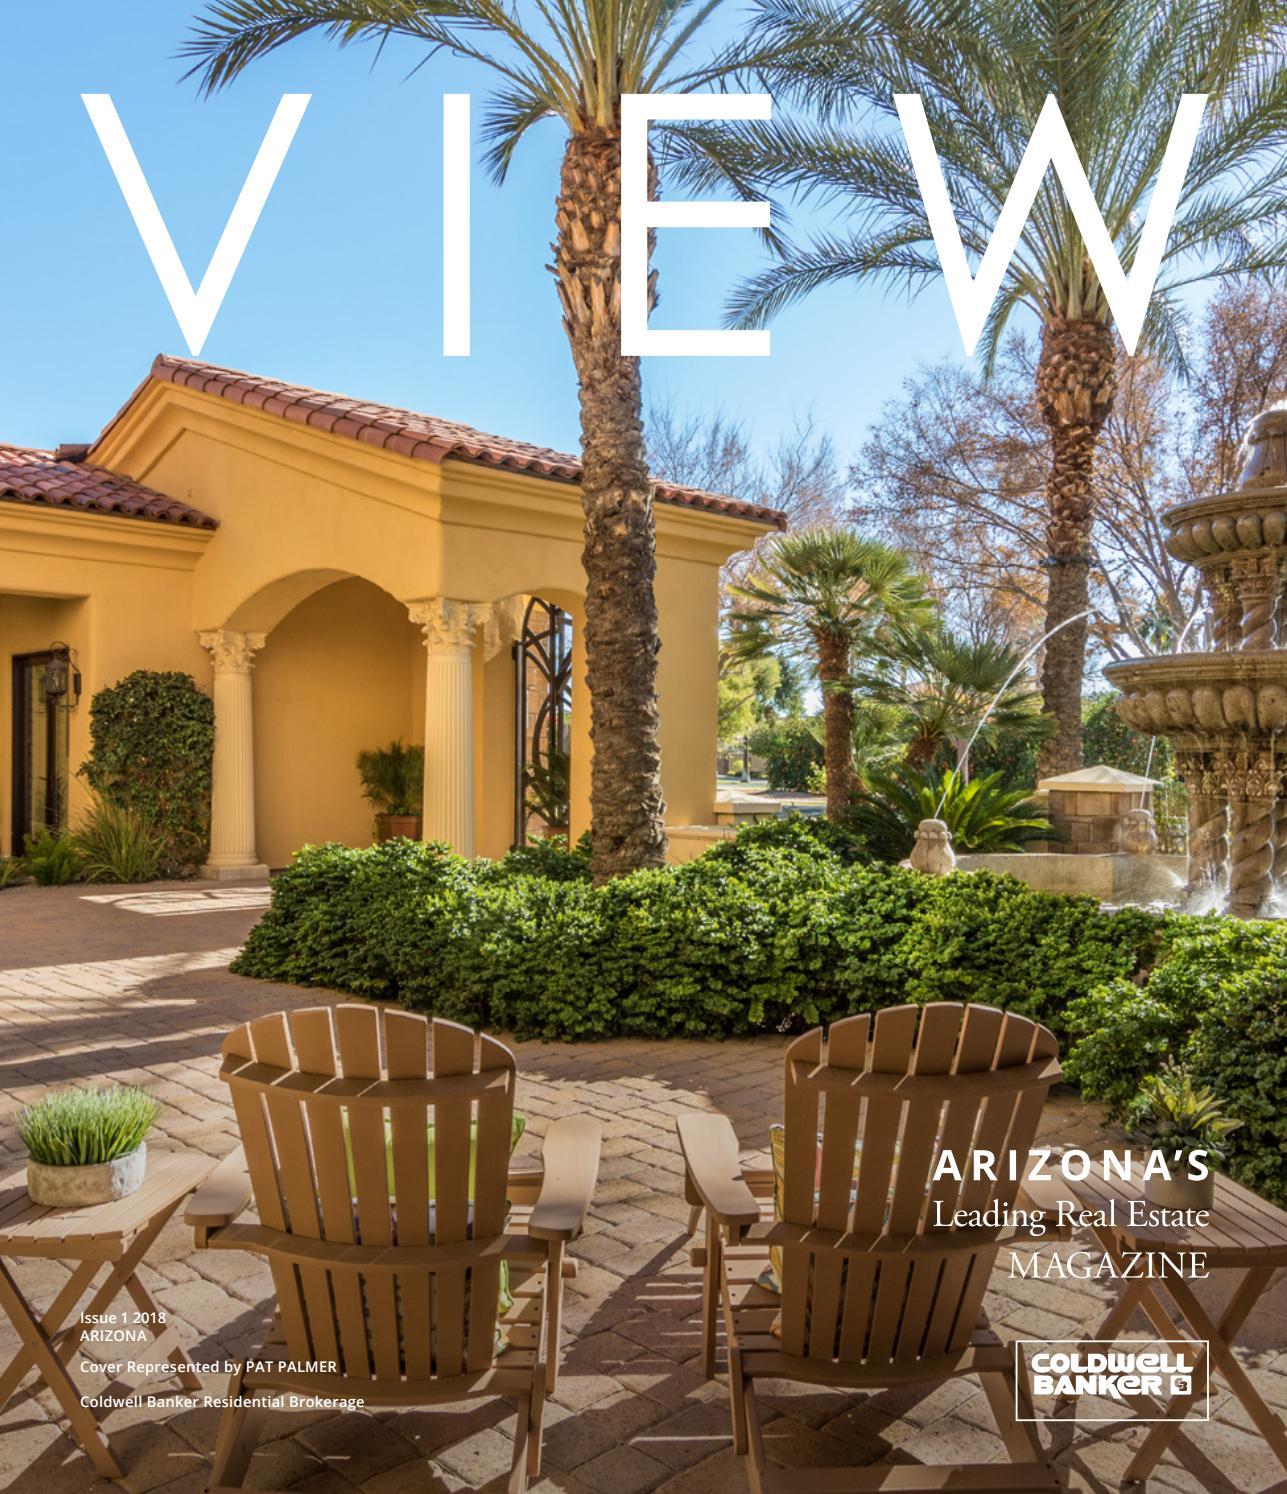 401b56c2355916 VIEW - Arizona by Coldwell Banker - issuu